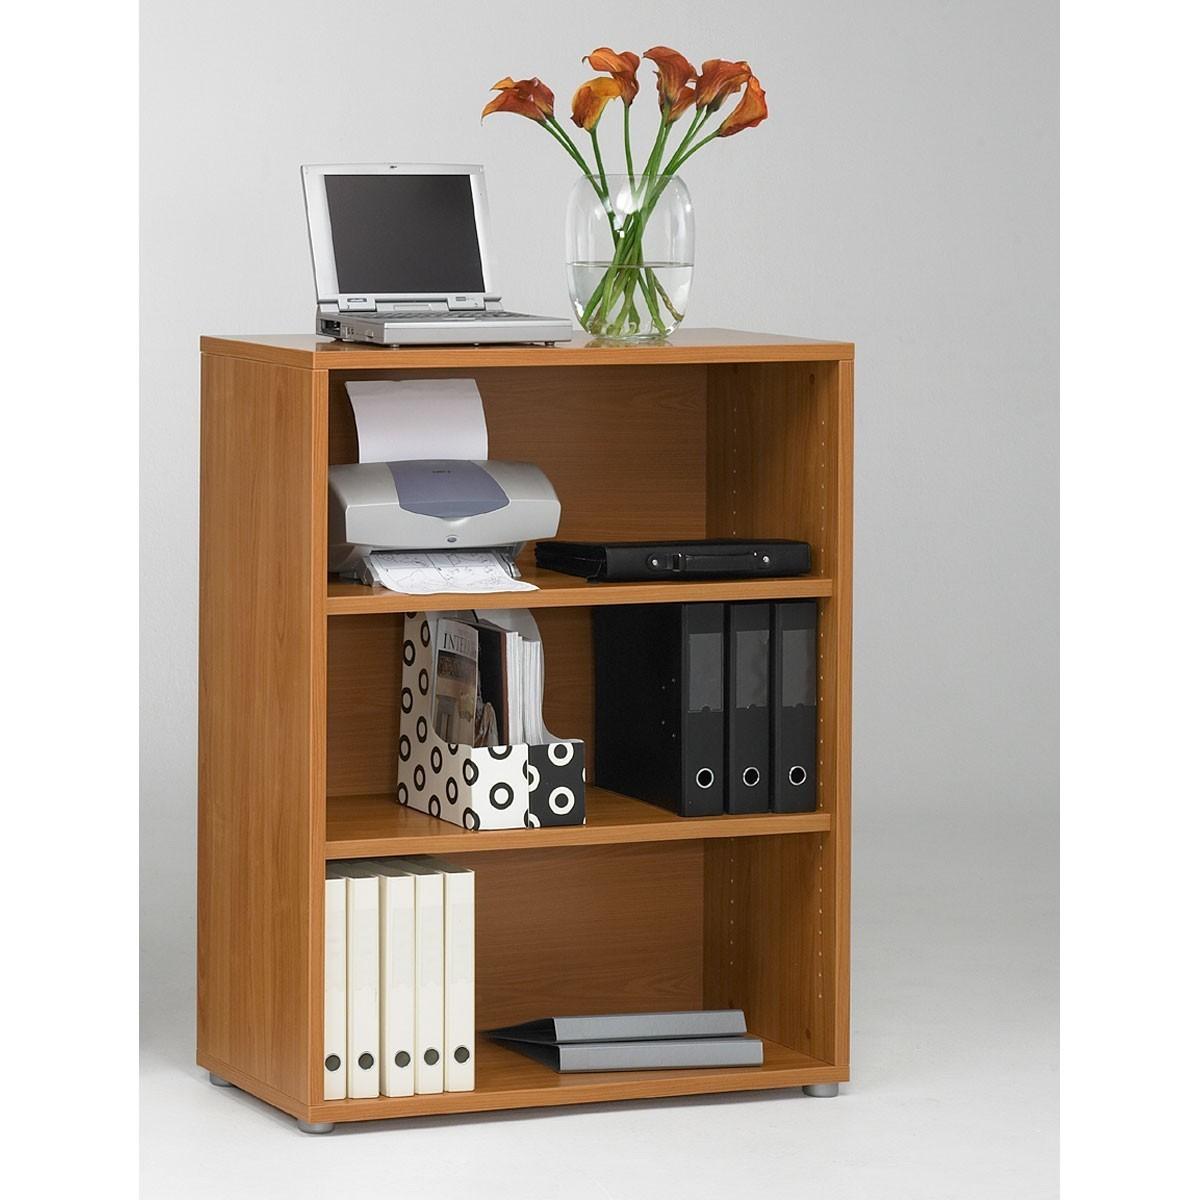 regal prima in kirschbaum. Black Bedroom Furniture Sets. Home Design Ideas